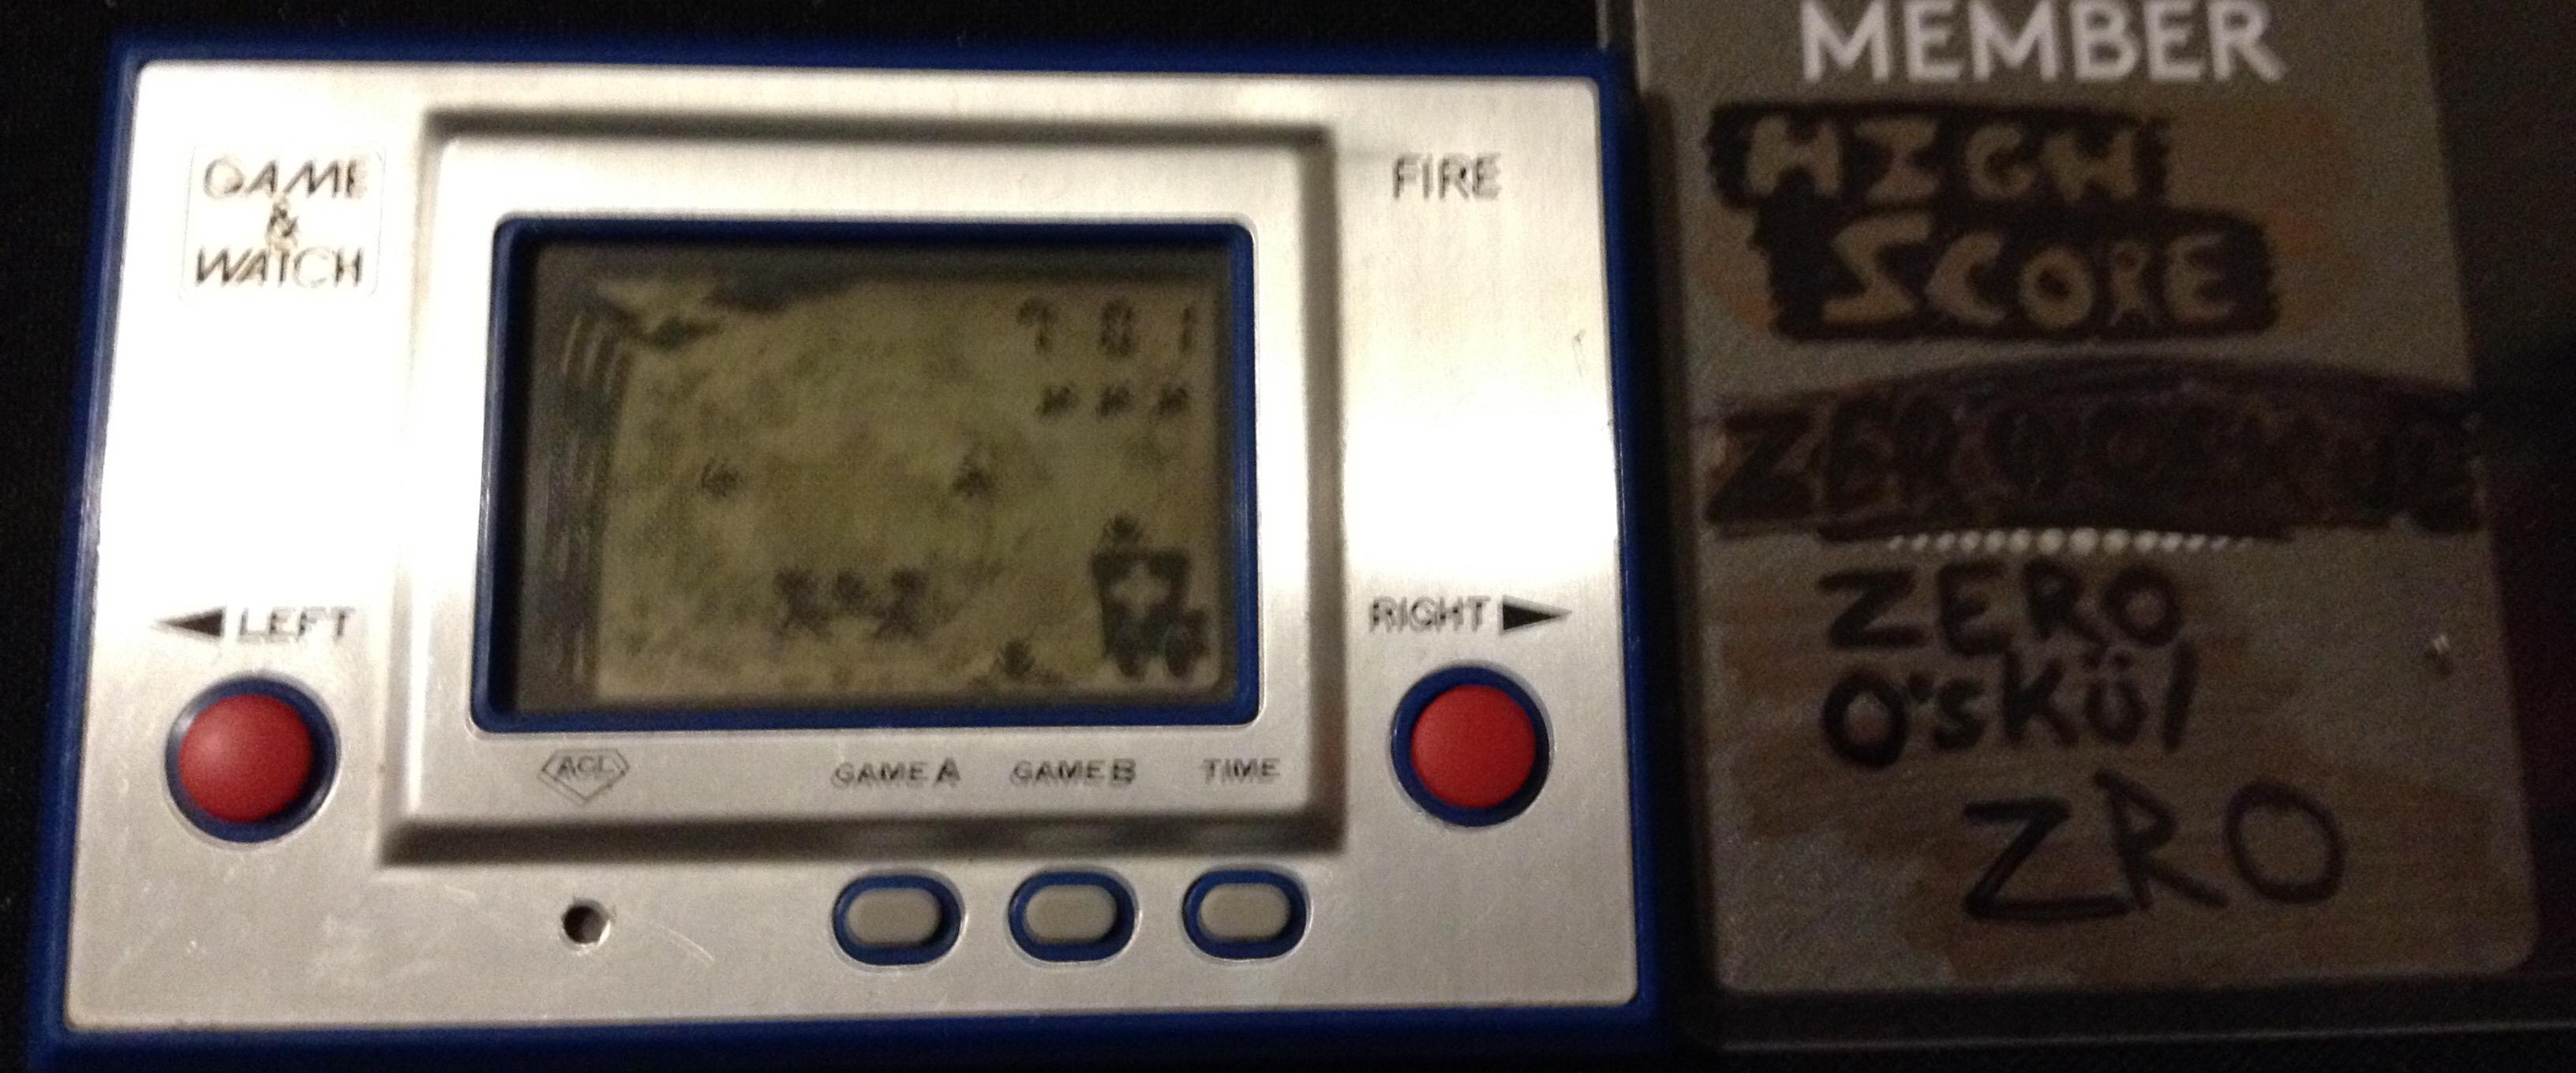 Game & Watch: Fire [aka Fireman Fireman] [Game A] 701 points